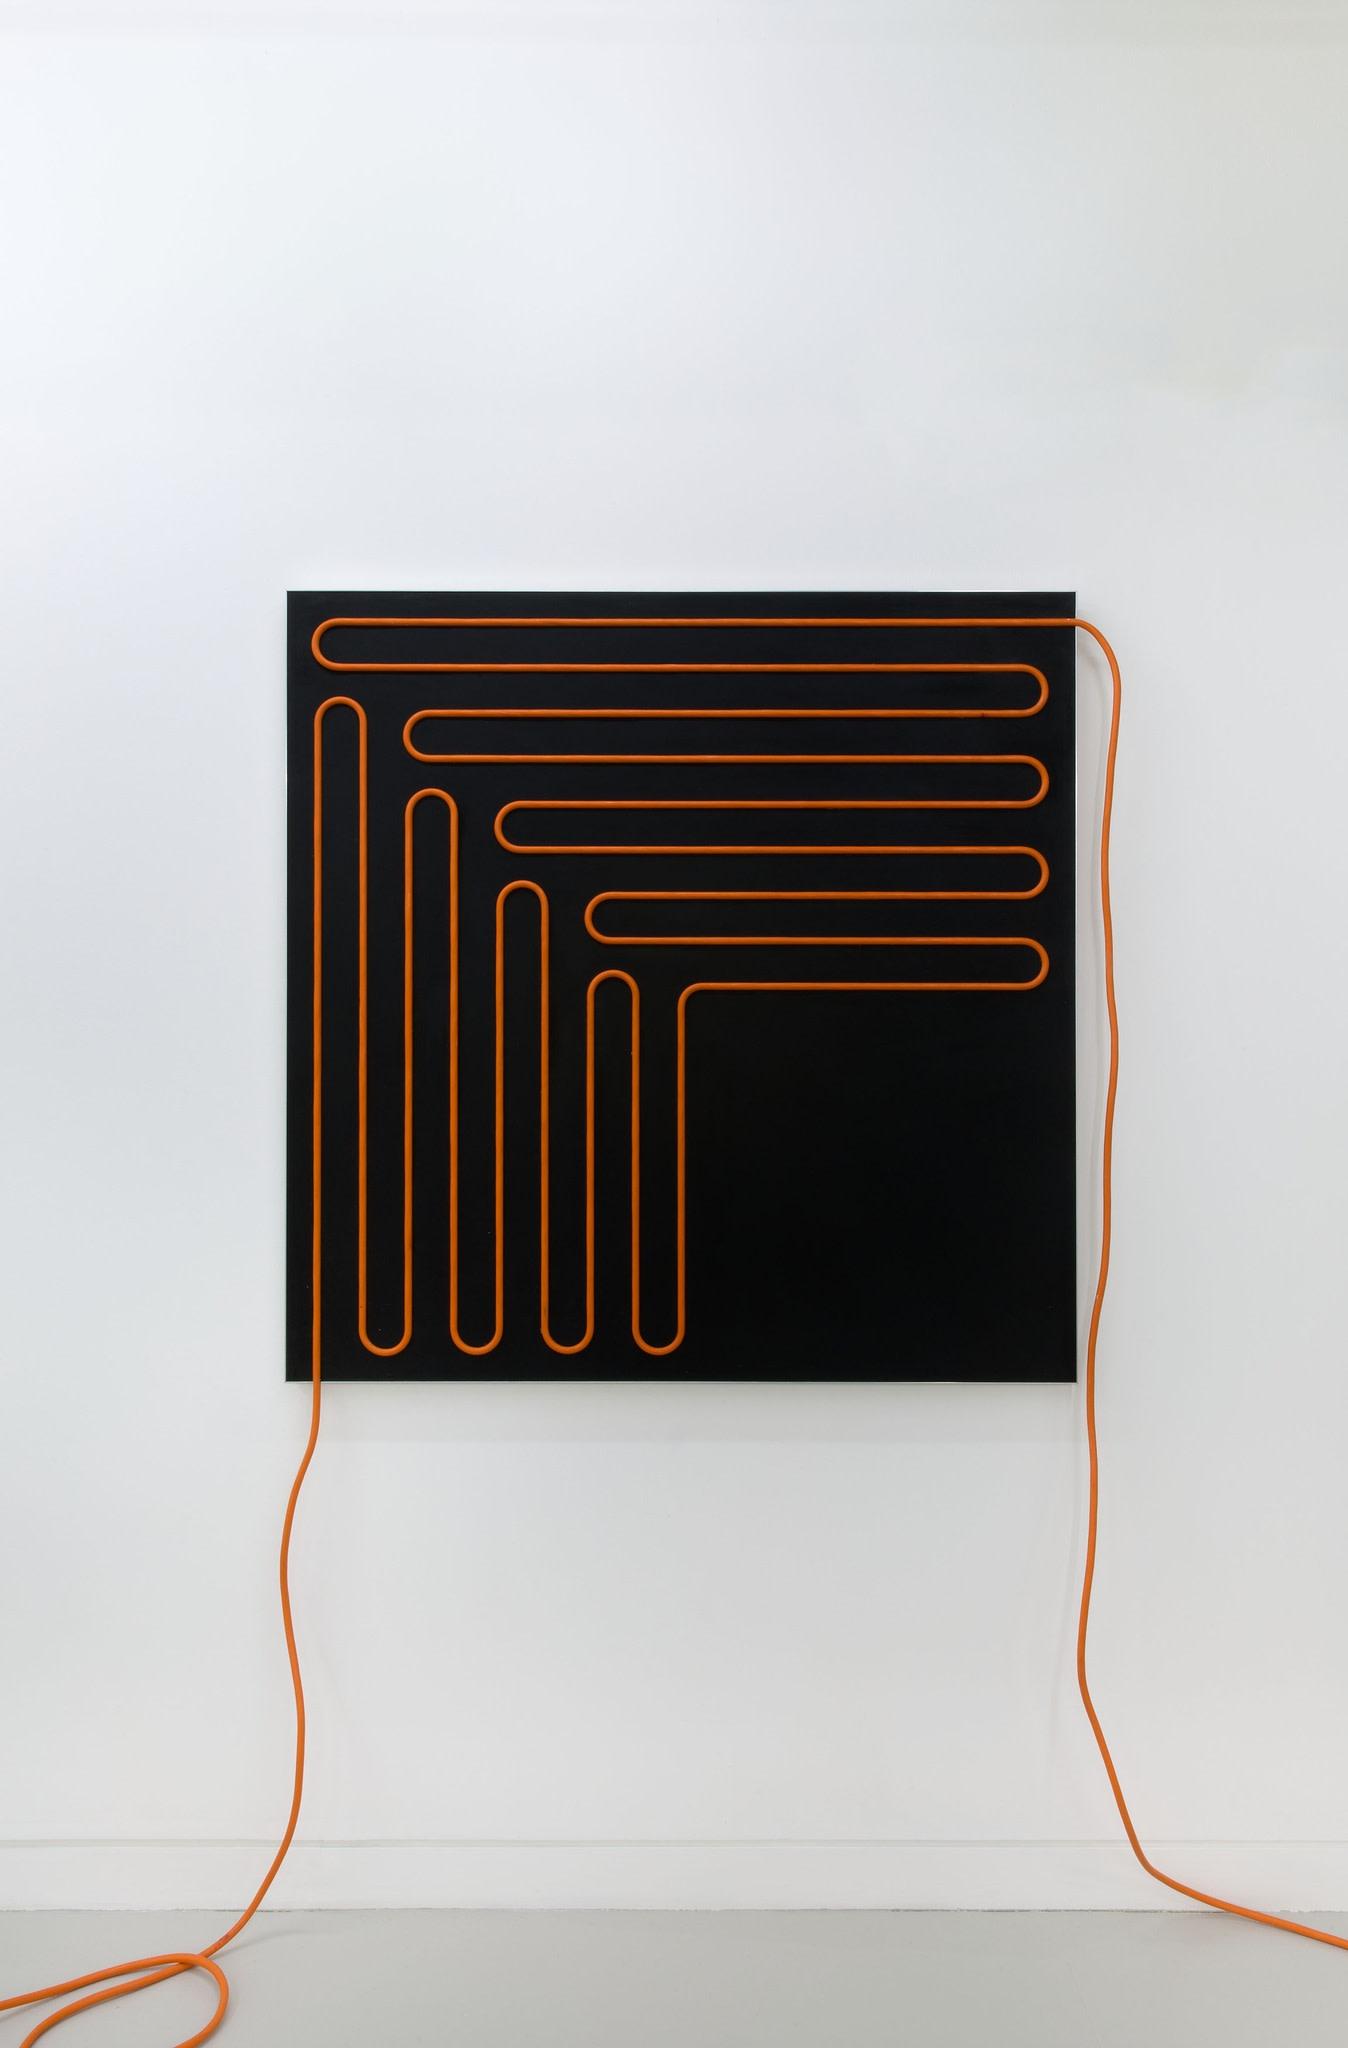 <span class=&#34;link fancybox-details-link&#34;><a href=&#34;/artists/44-jacob-dahlgren/works/8755/&#34;>View Detail Page</a></span><div class=&#34;artist&#34;><strong>Jacob Dahlgren</strong></div> <div class=&#34;title&#34;><em>Third Uncle #1</em>, 2015</div> <div class=&#34;medium&#34;>MDF, acrylic paint, electrical cable, aluminium</div> <div class=&#34;dimensions&#34;>104 x 104 cm<br />41 x 41 in</div><div class=&#34;copyright_line&#34;>Copyright The Artist</div>